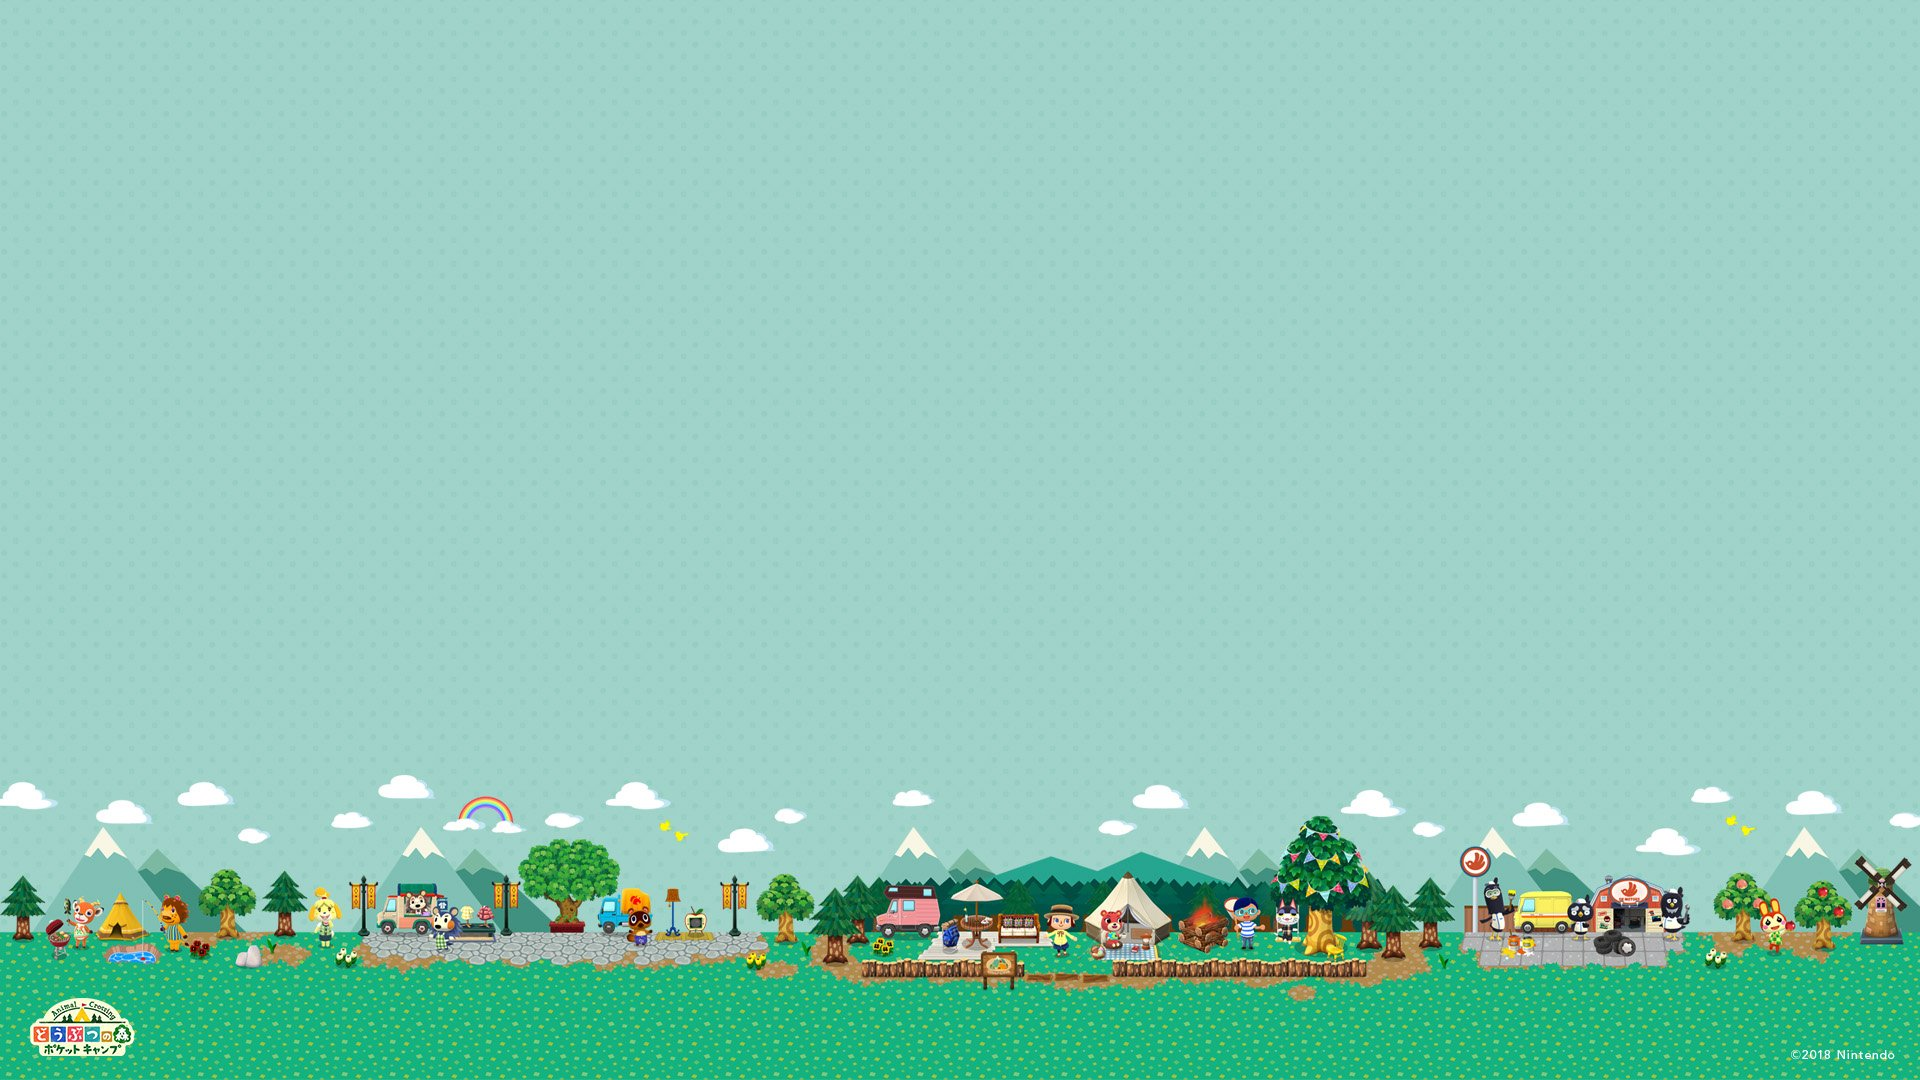 Animal Crossing Fall Wallpaper Animal Crossing Hd Wallpaper Background Image